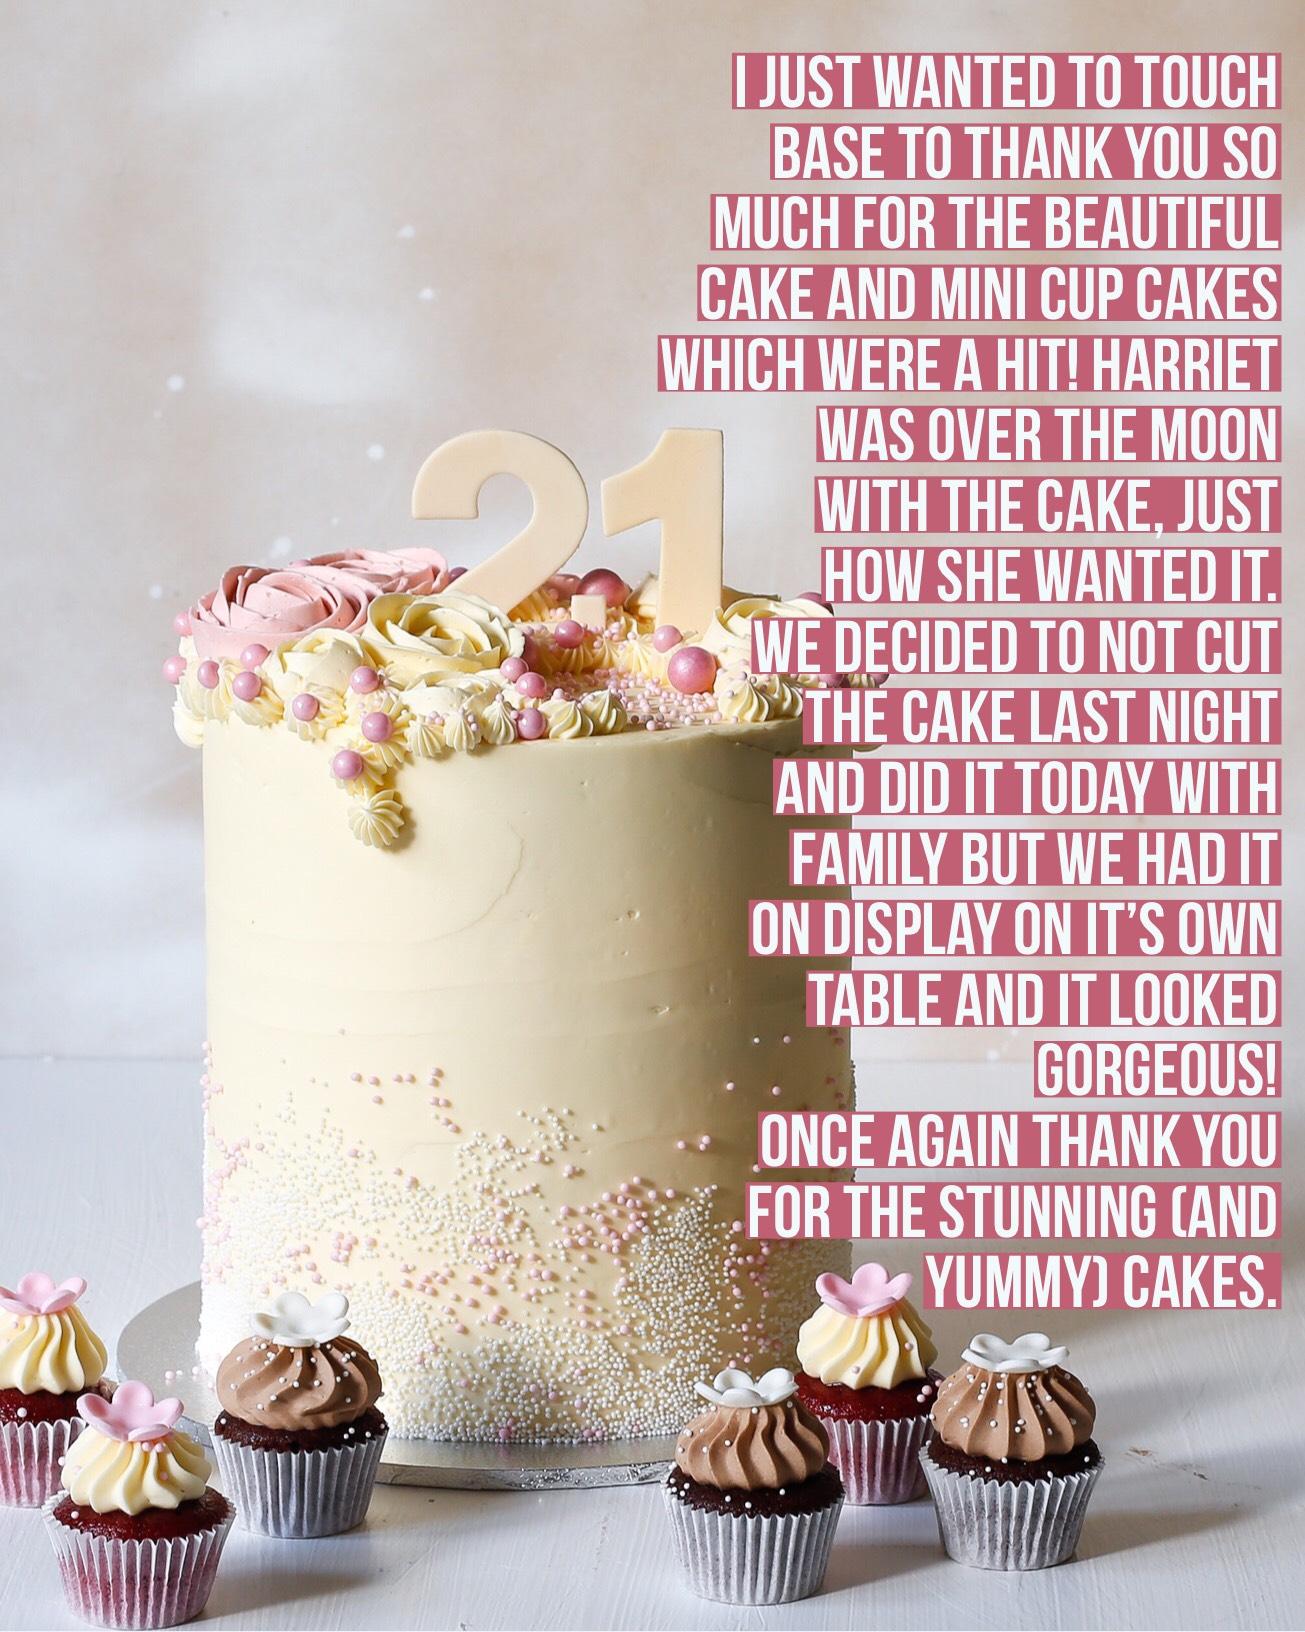 Sydney Cakes, Baked By Fiona 21st birthday cakes